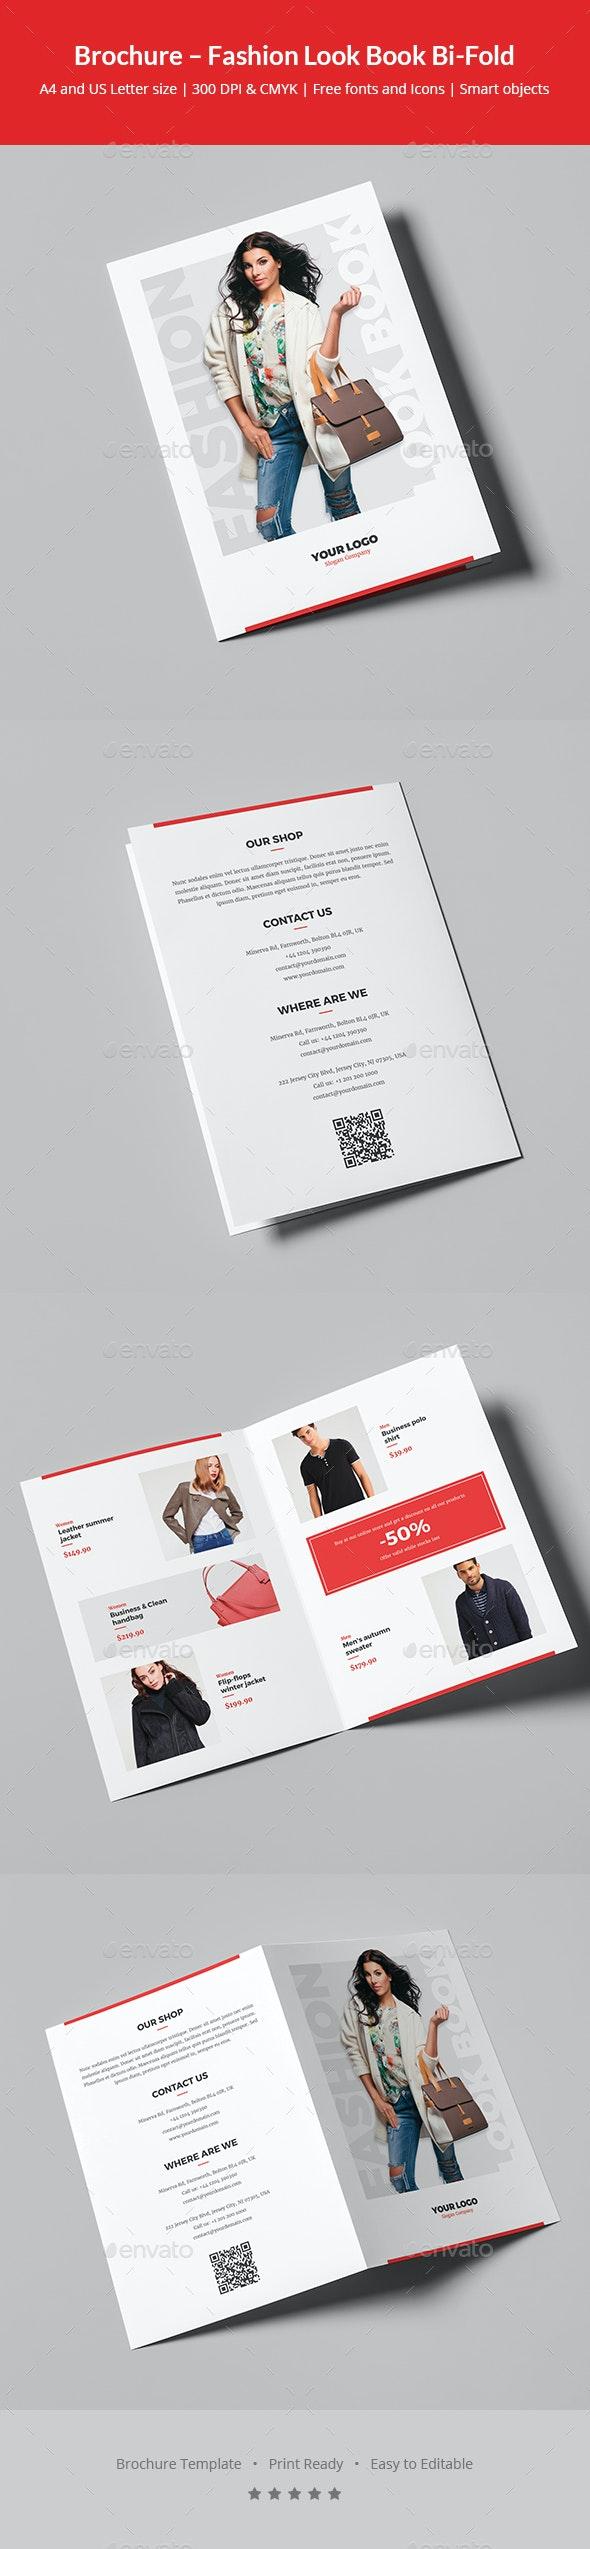 Brochure – Fashion Look Book Bi-Fold - Informational Brochures